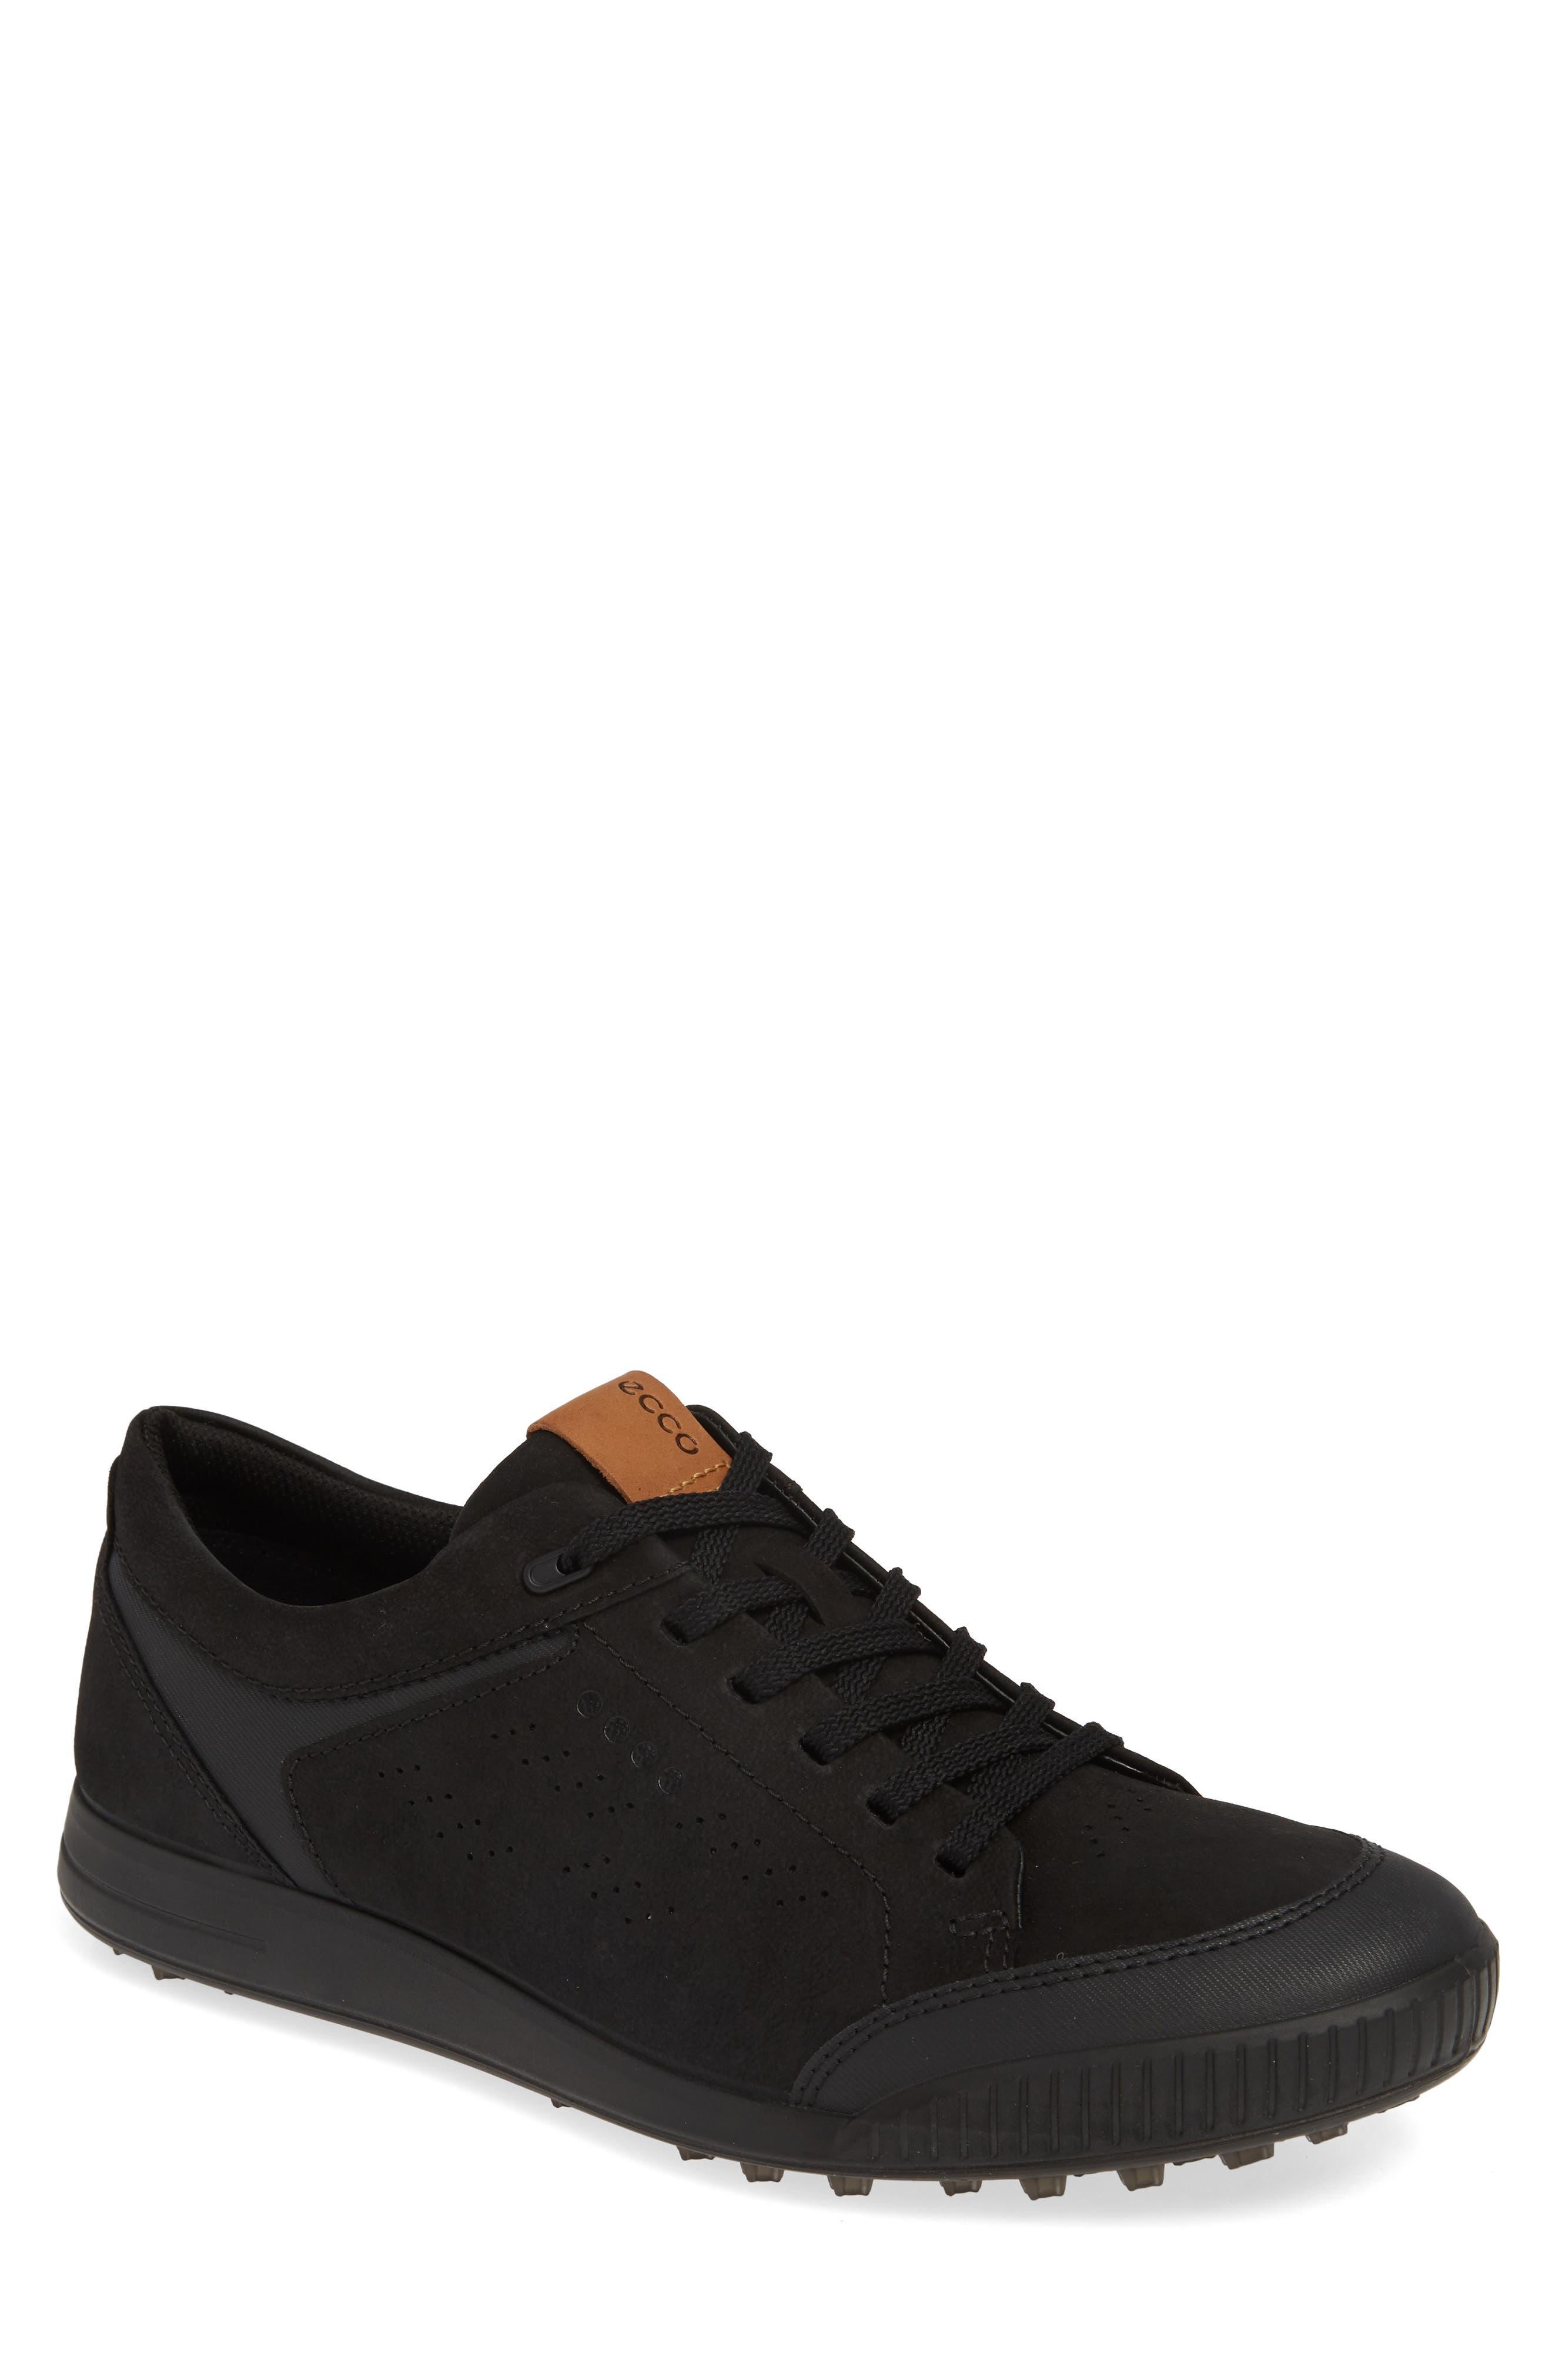 ECCO Street Retro LX Golf Shoe (Men